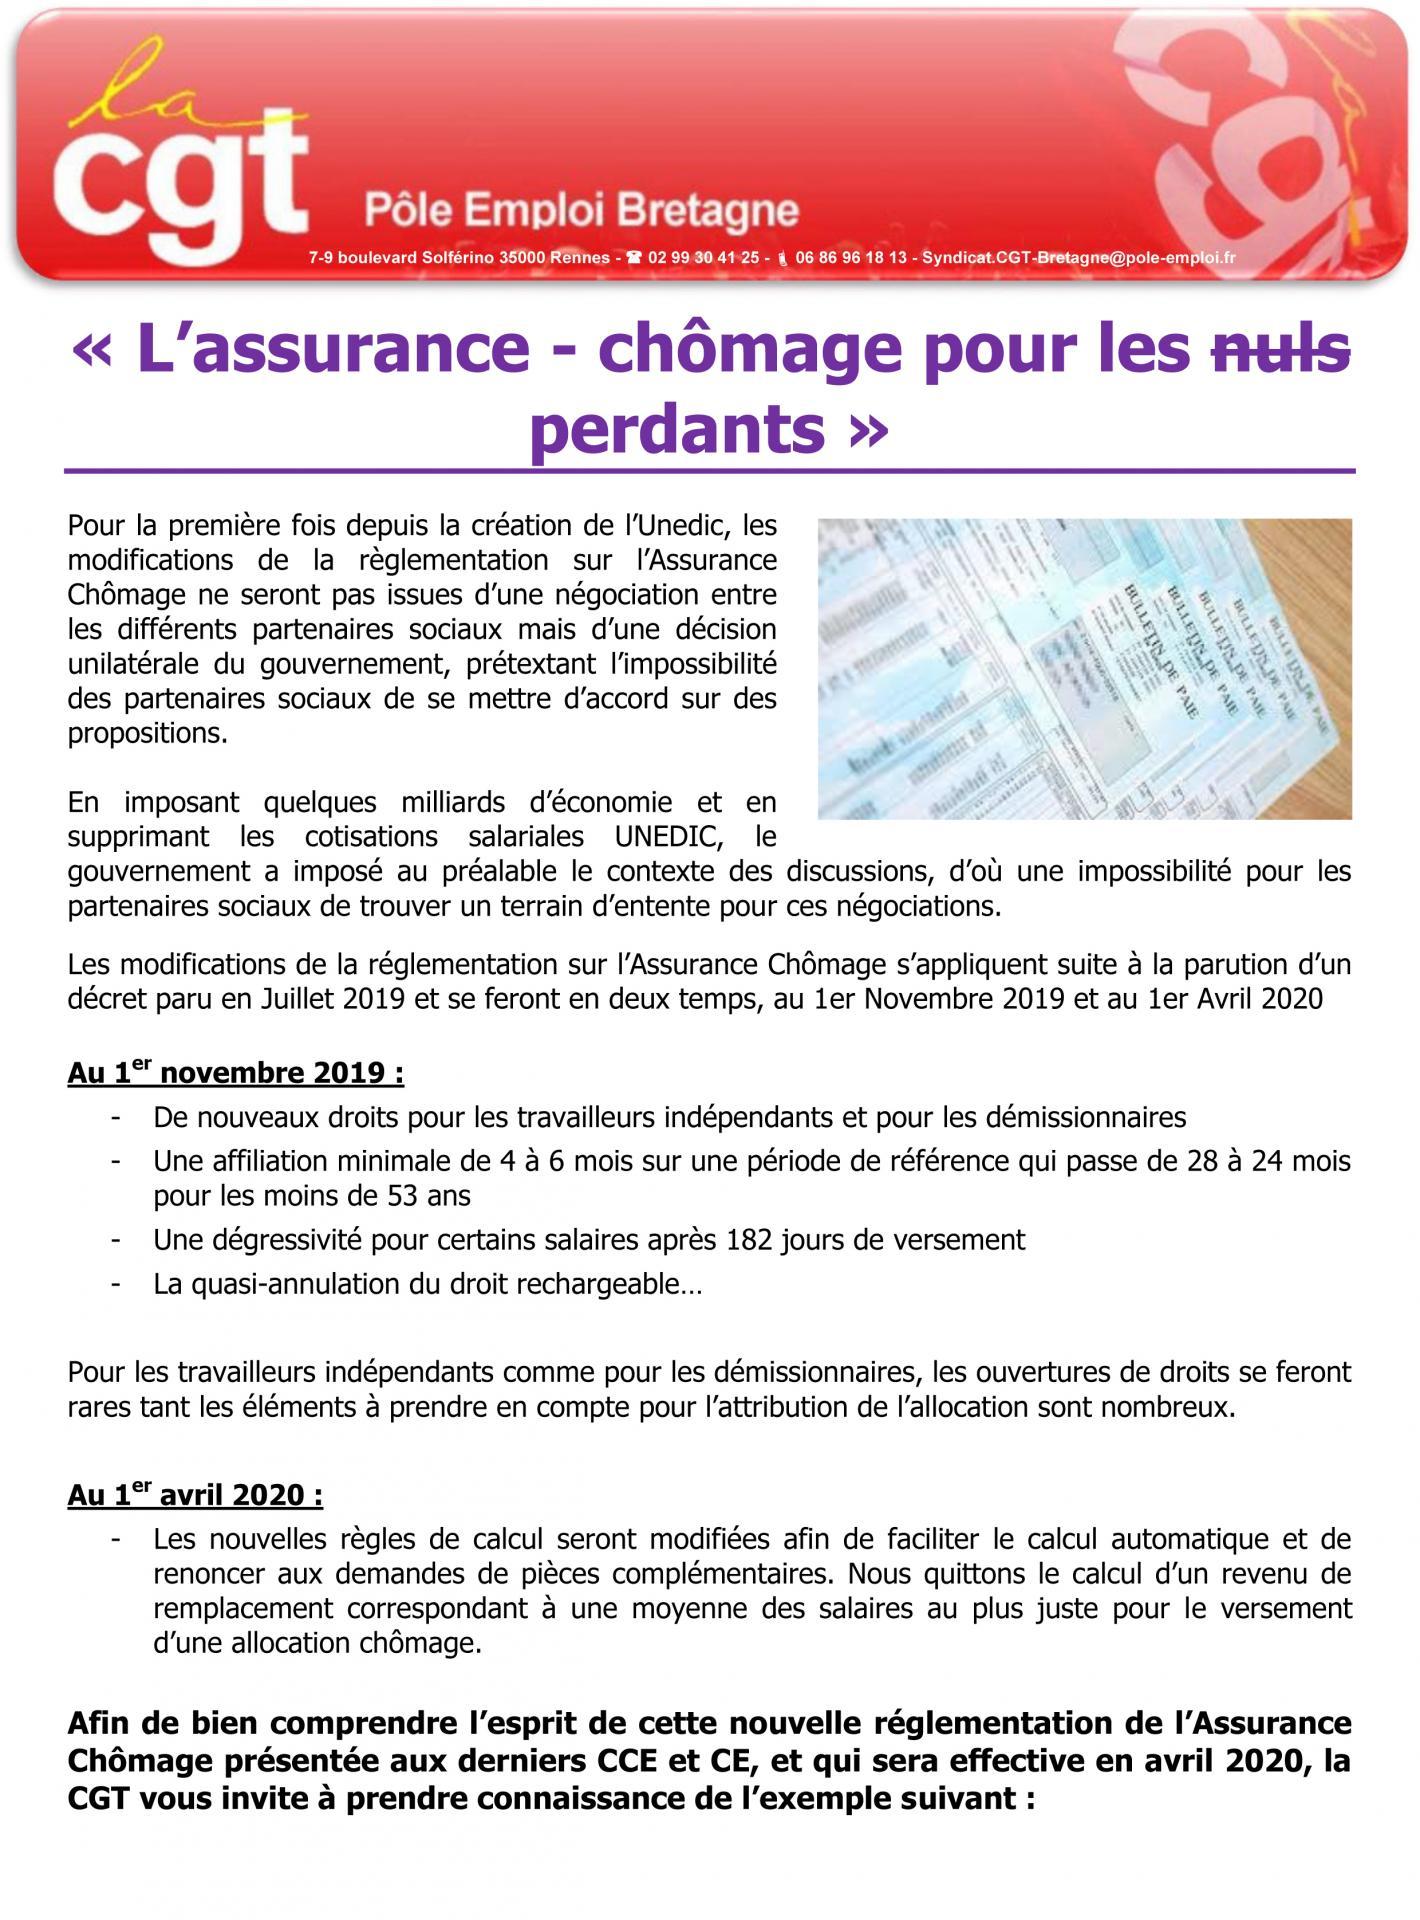 2019 09 30 cgt assurance chomage 1